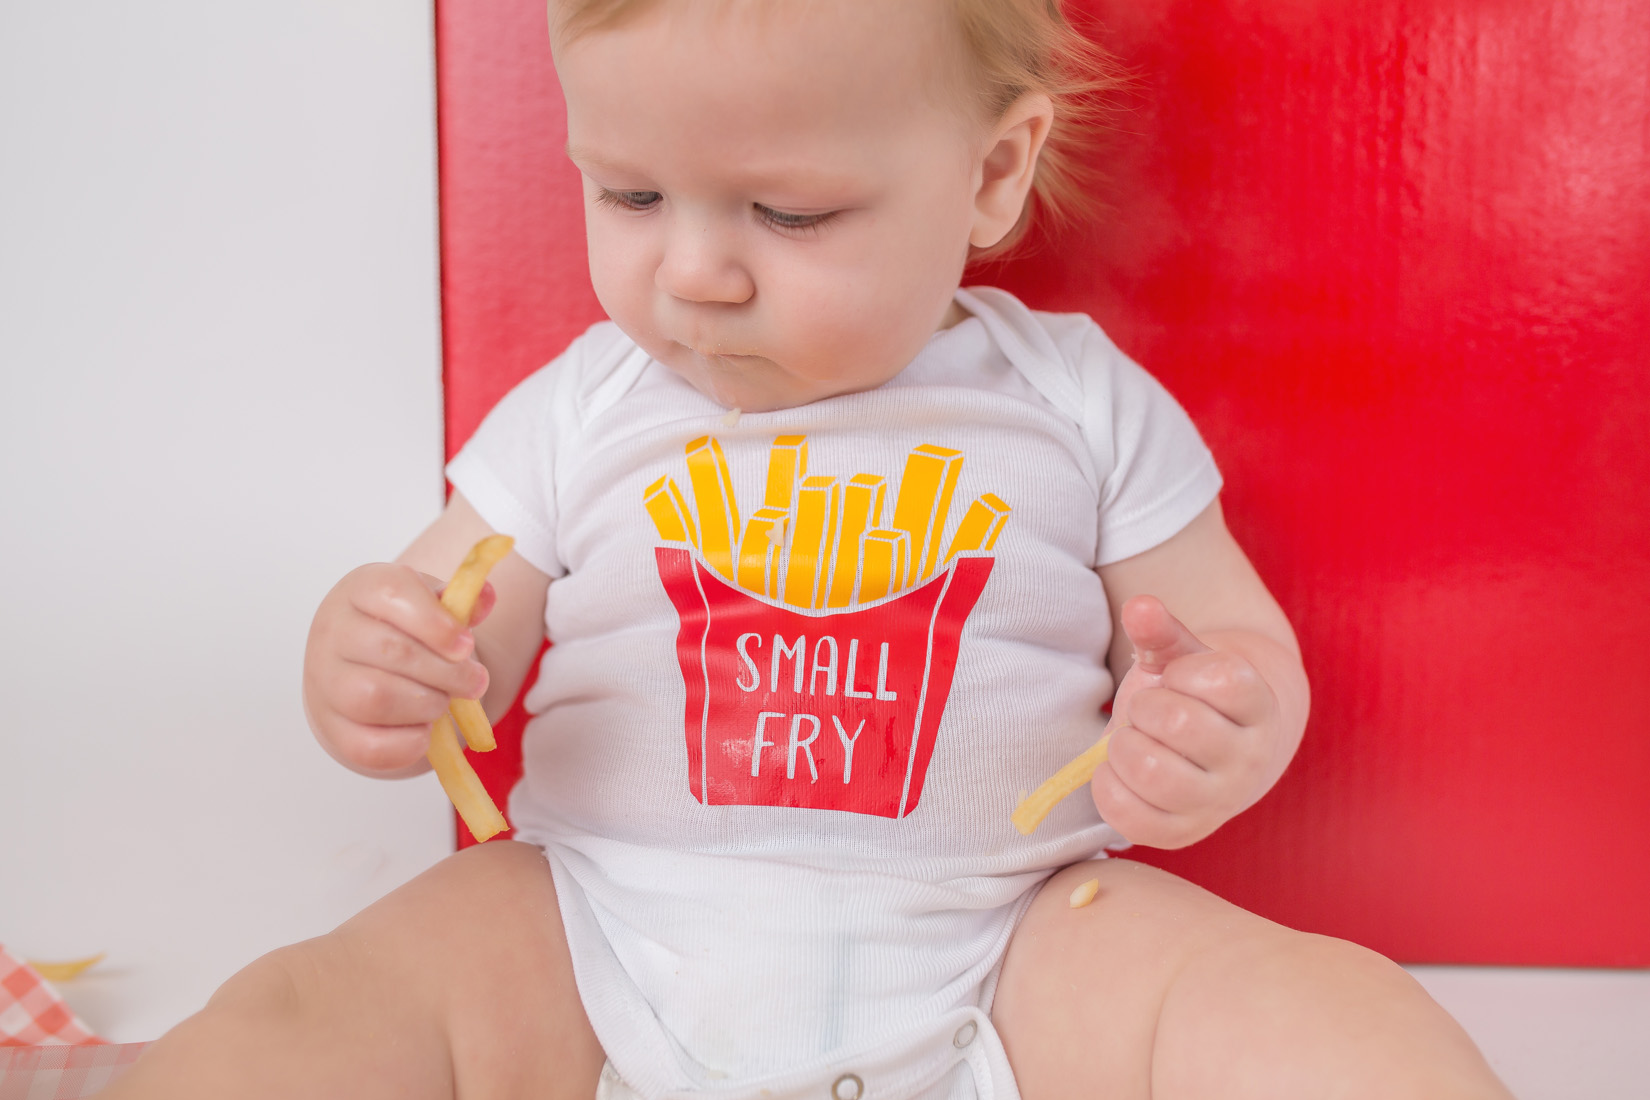 Small Fry 031.jpg